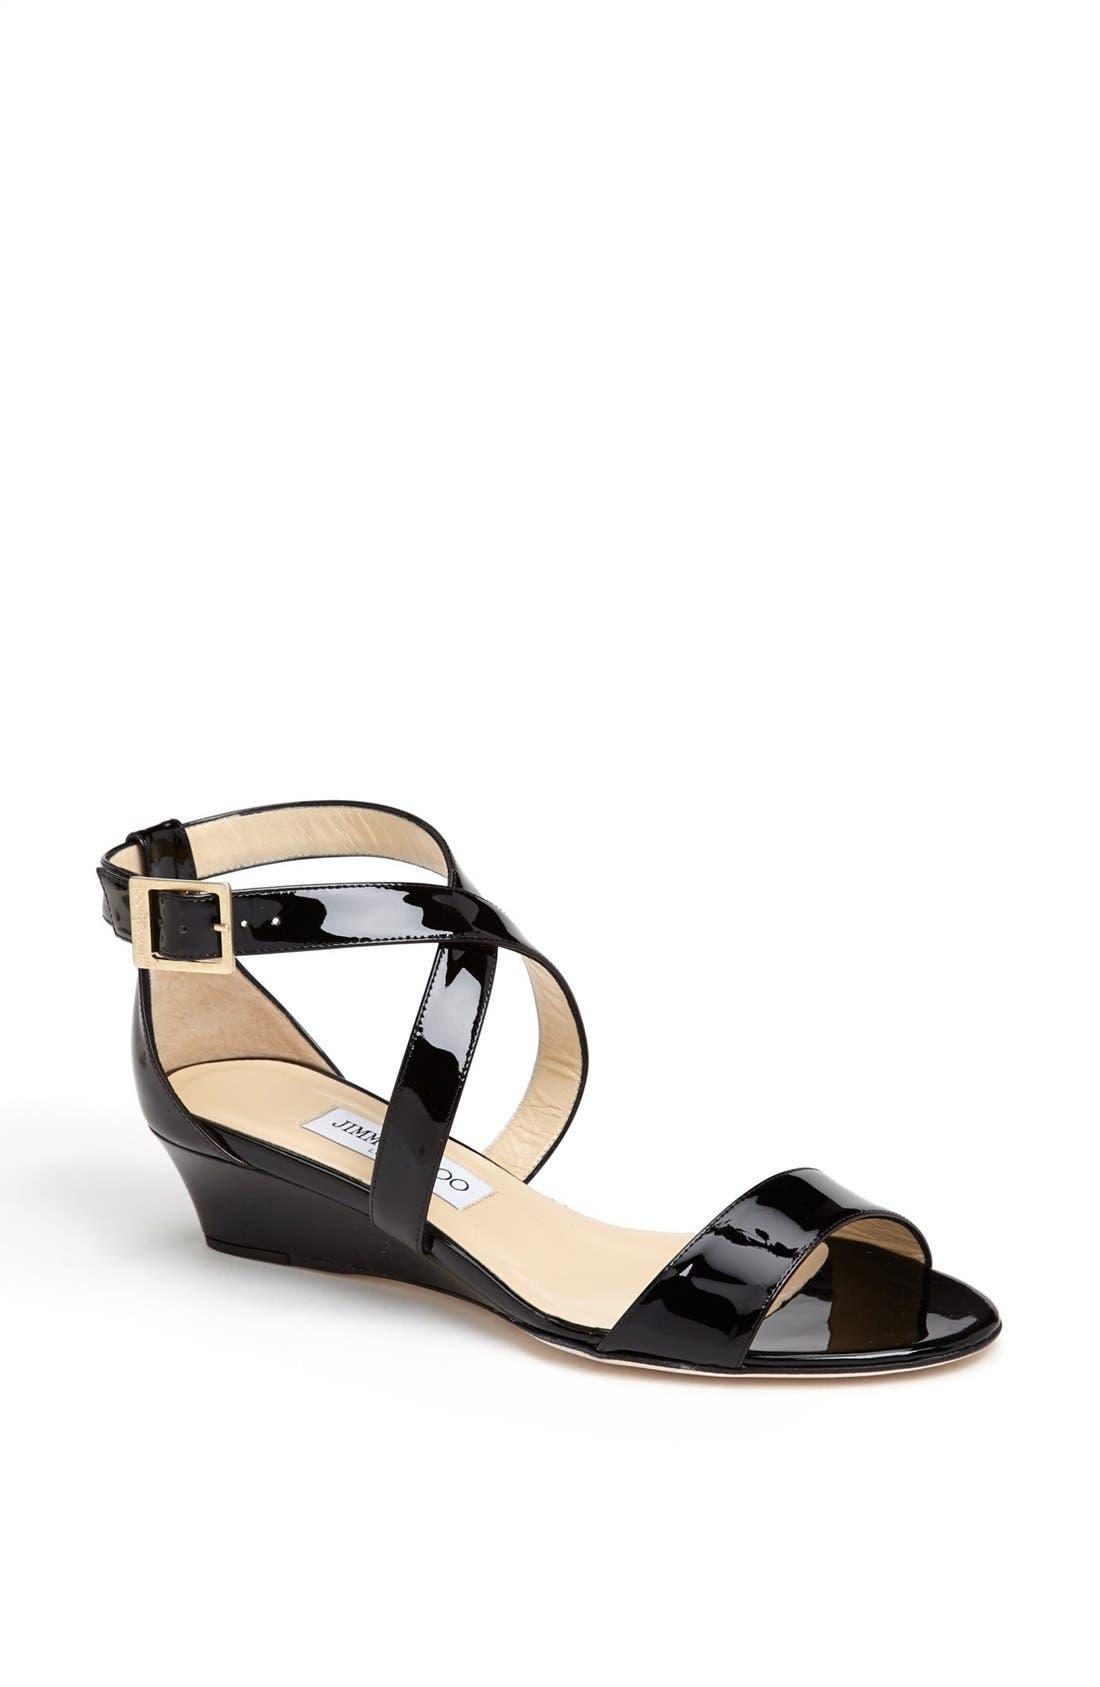 Alternate Image 1 Selected - Jimmy Choo 'Chiara' Strap Wedge Sandal (Women)